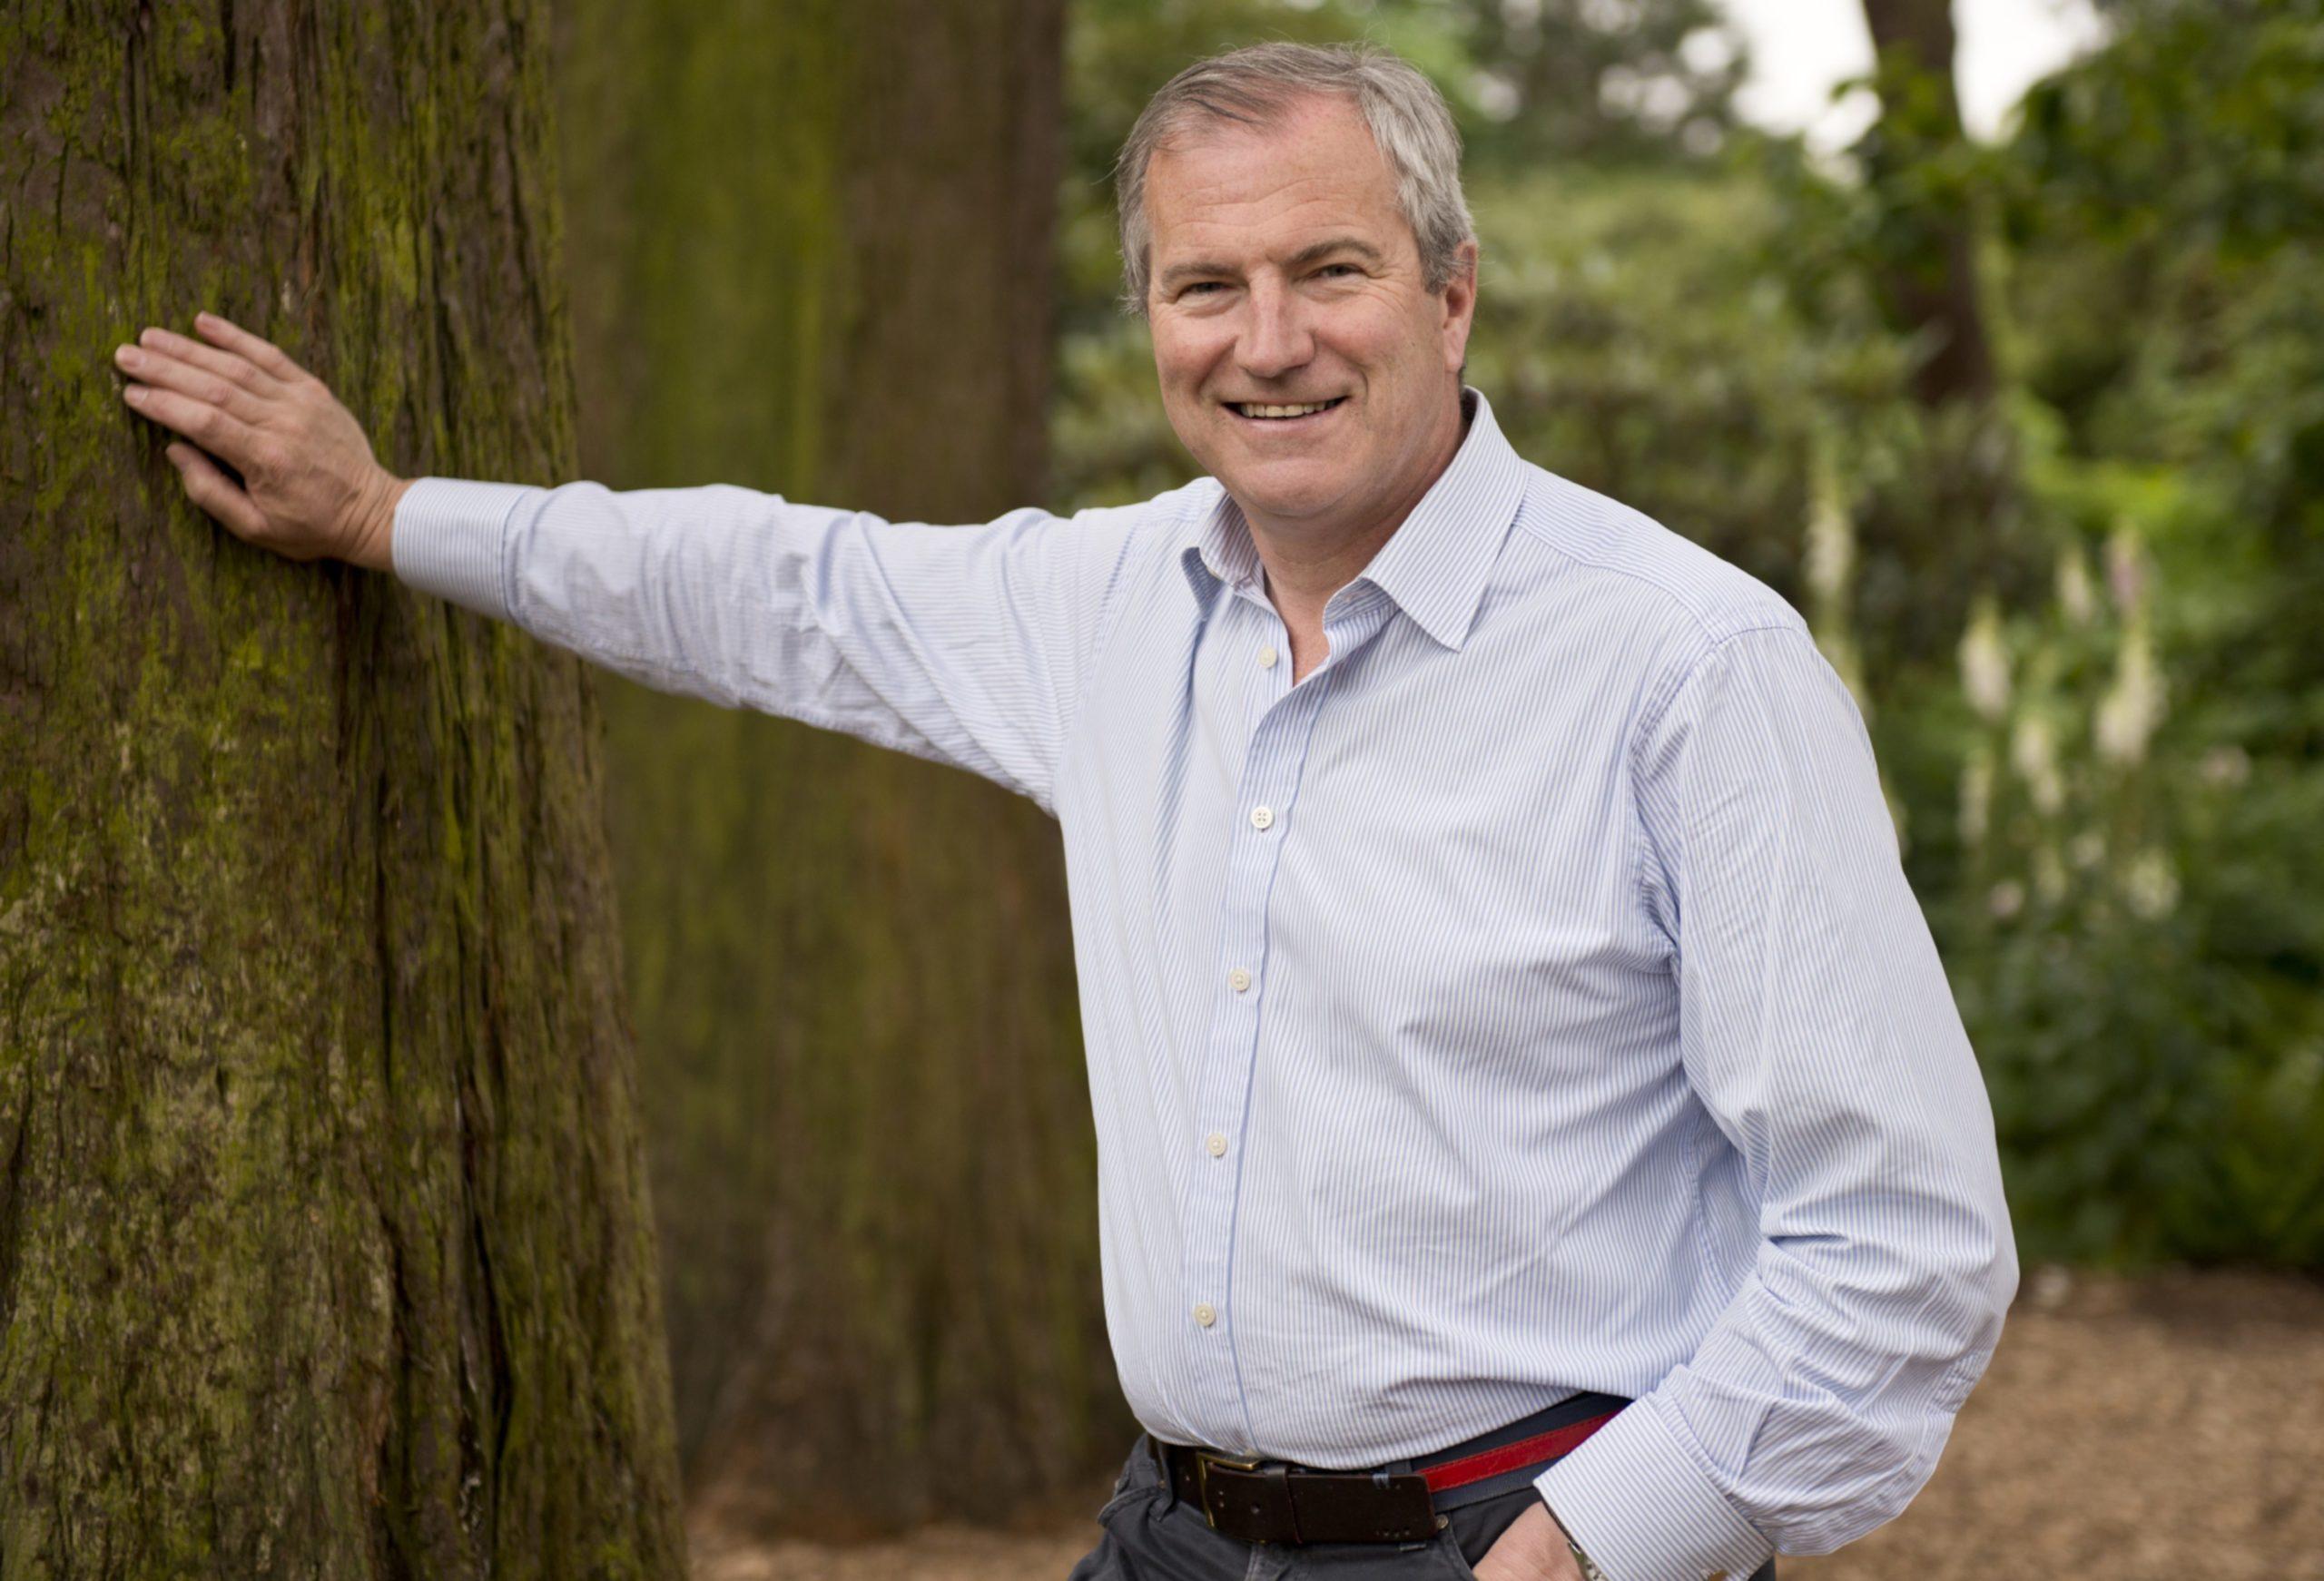 Simon Milne, 16th regius keeper of Royal Botanic Garden Edinburgh